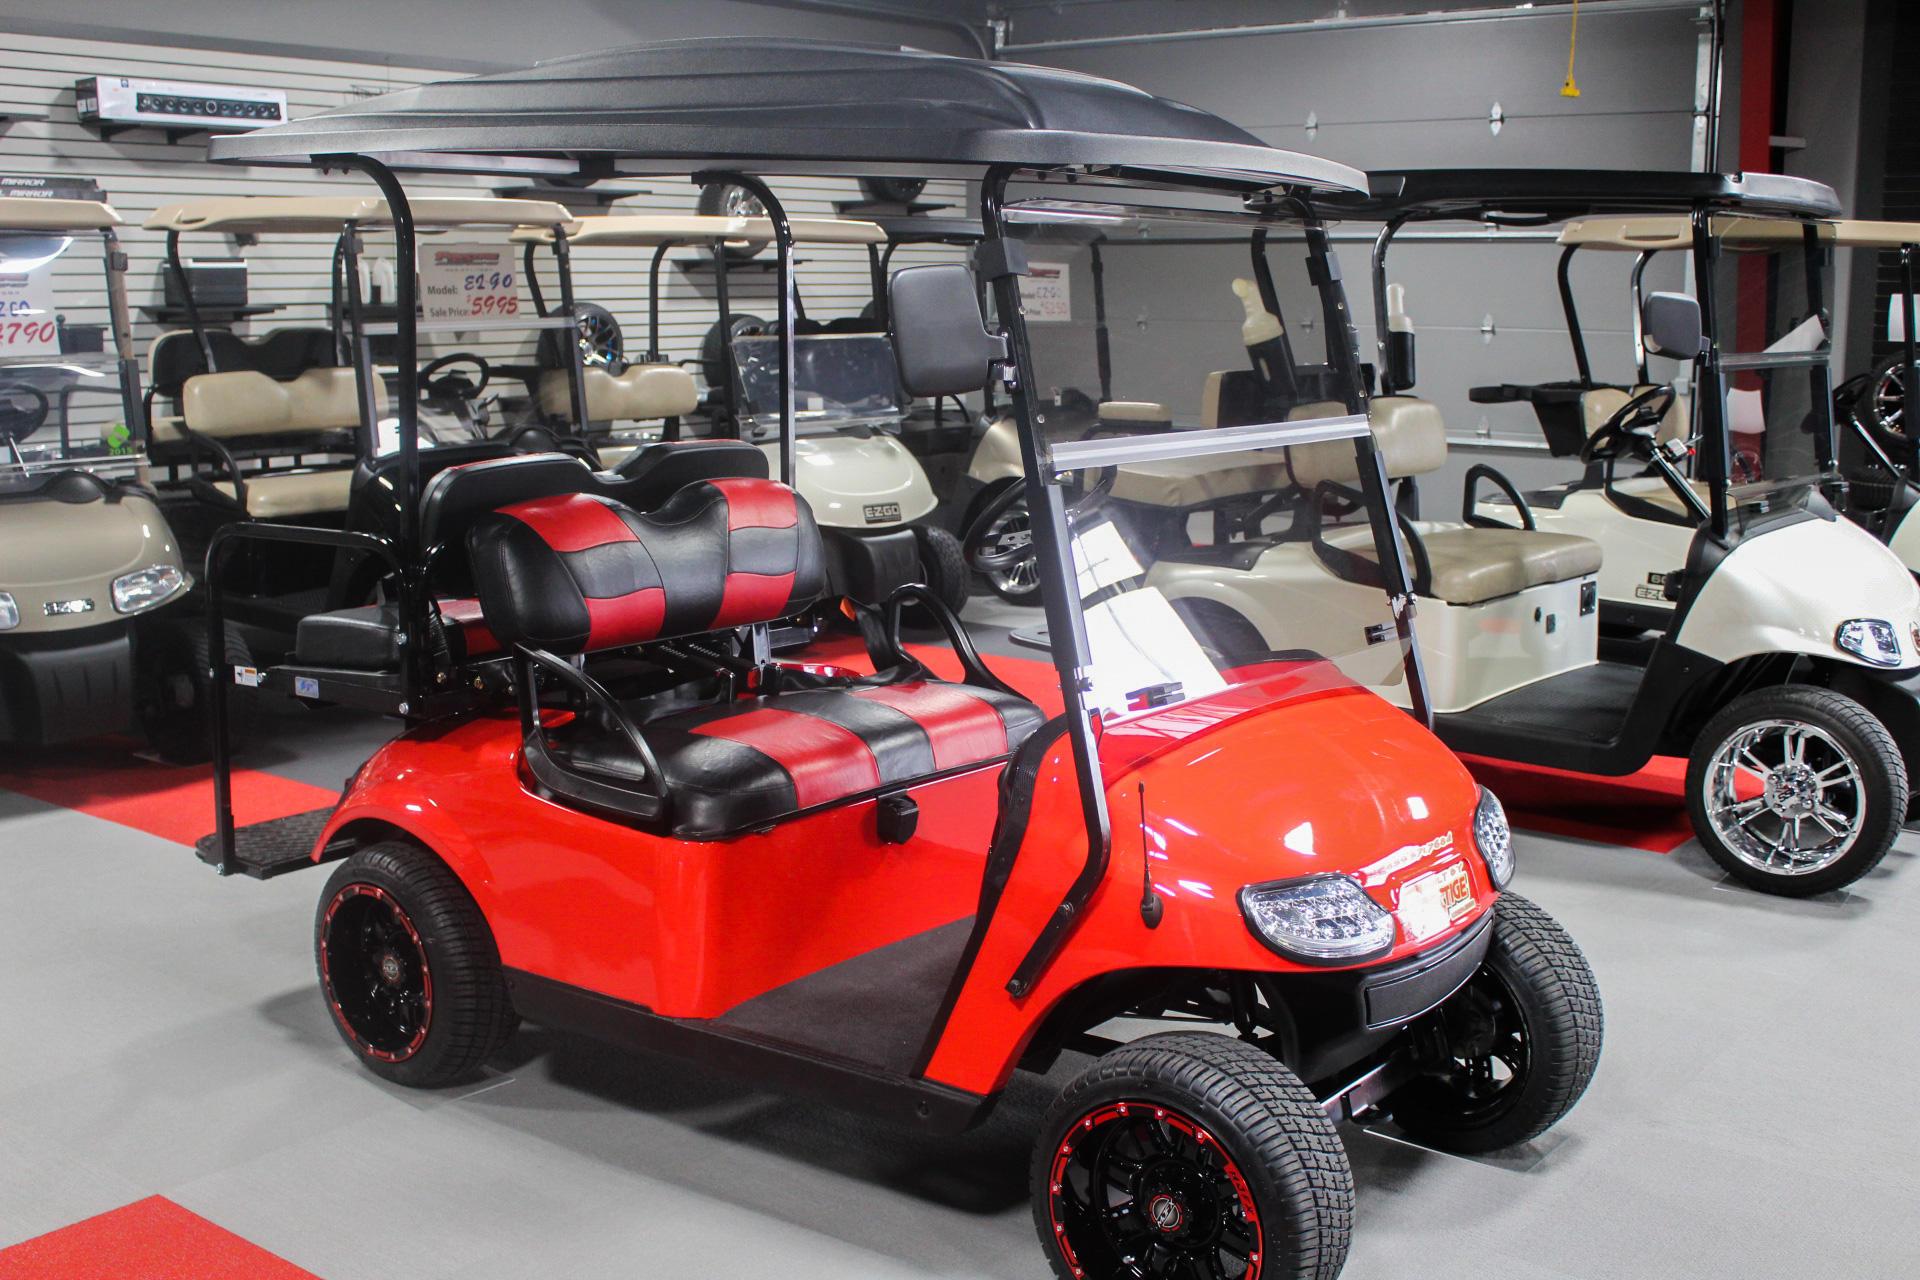 prestige auto body golf cars florence kentucky ky. Black Bedroom Furniture Sets. Home Design Ideas